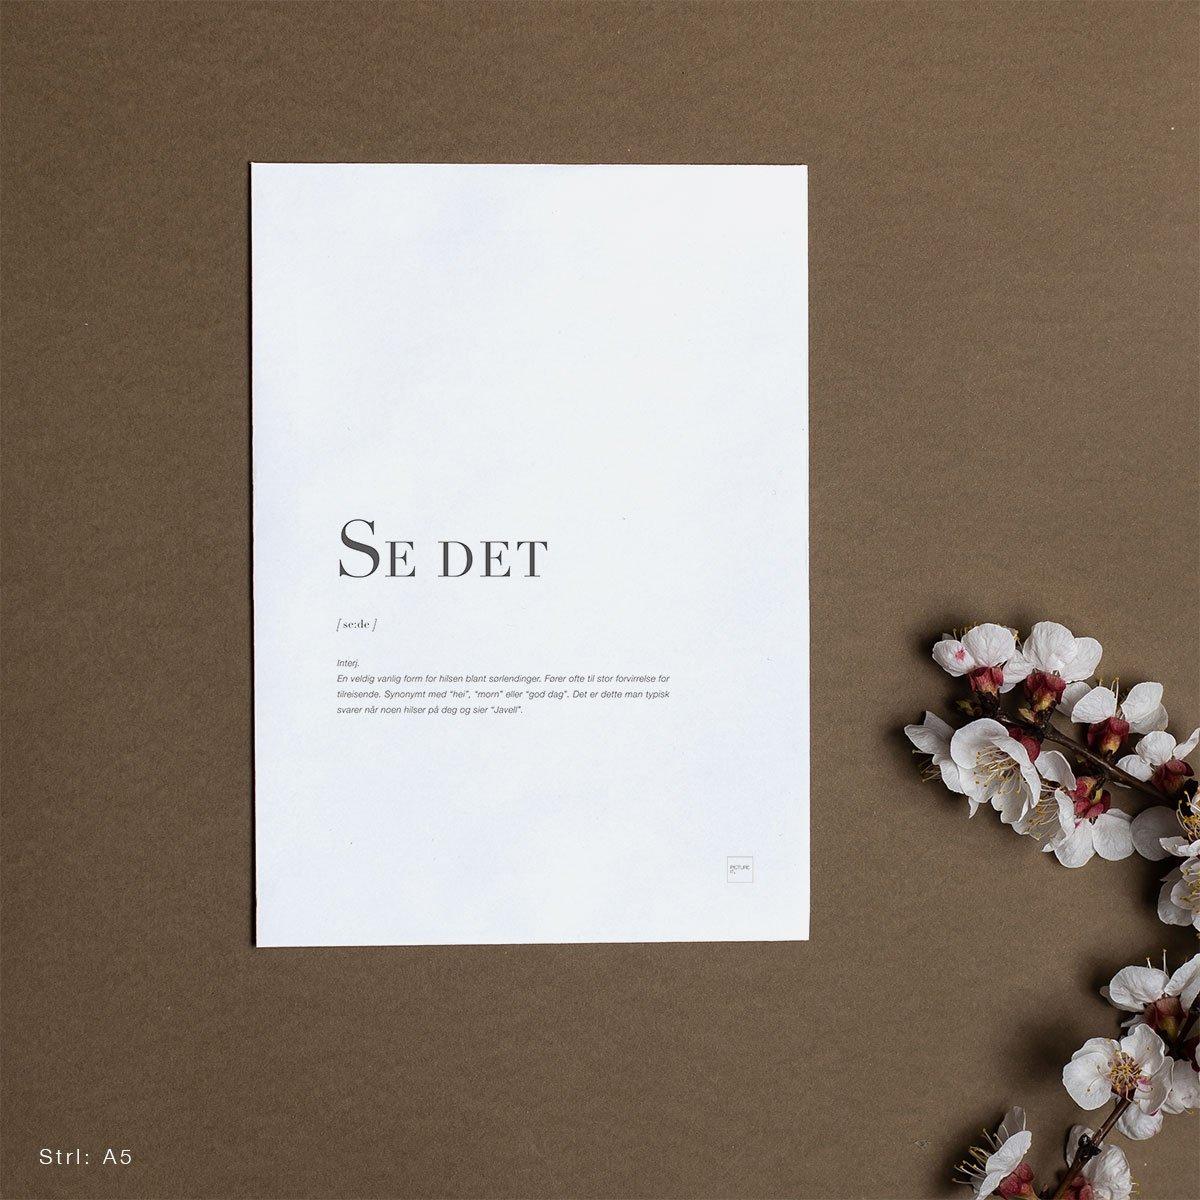 Dialekt kort – Se det